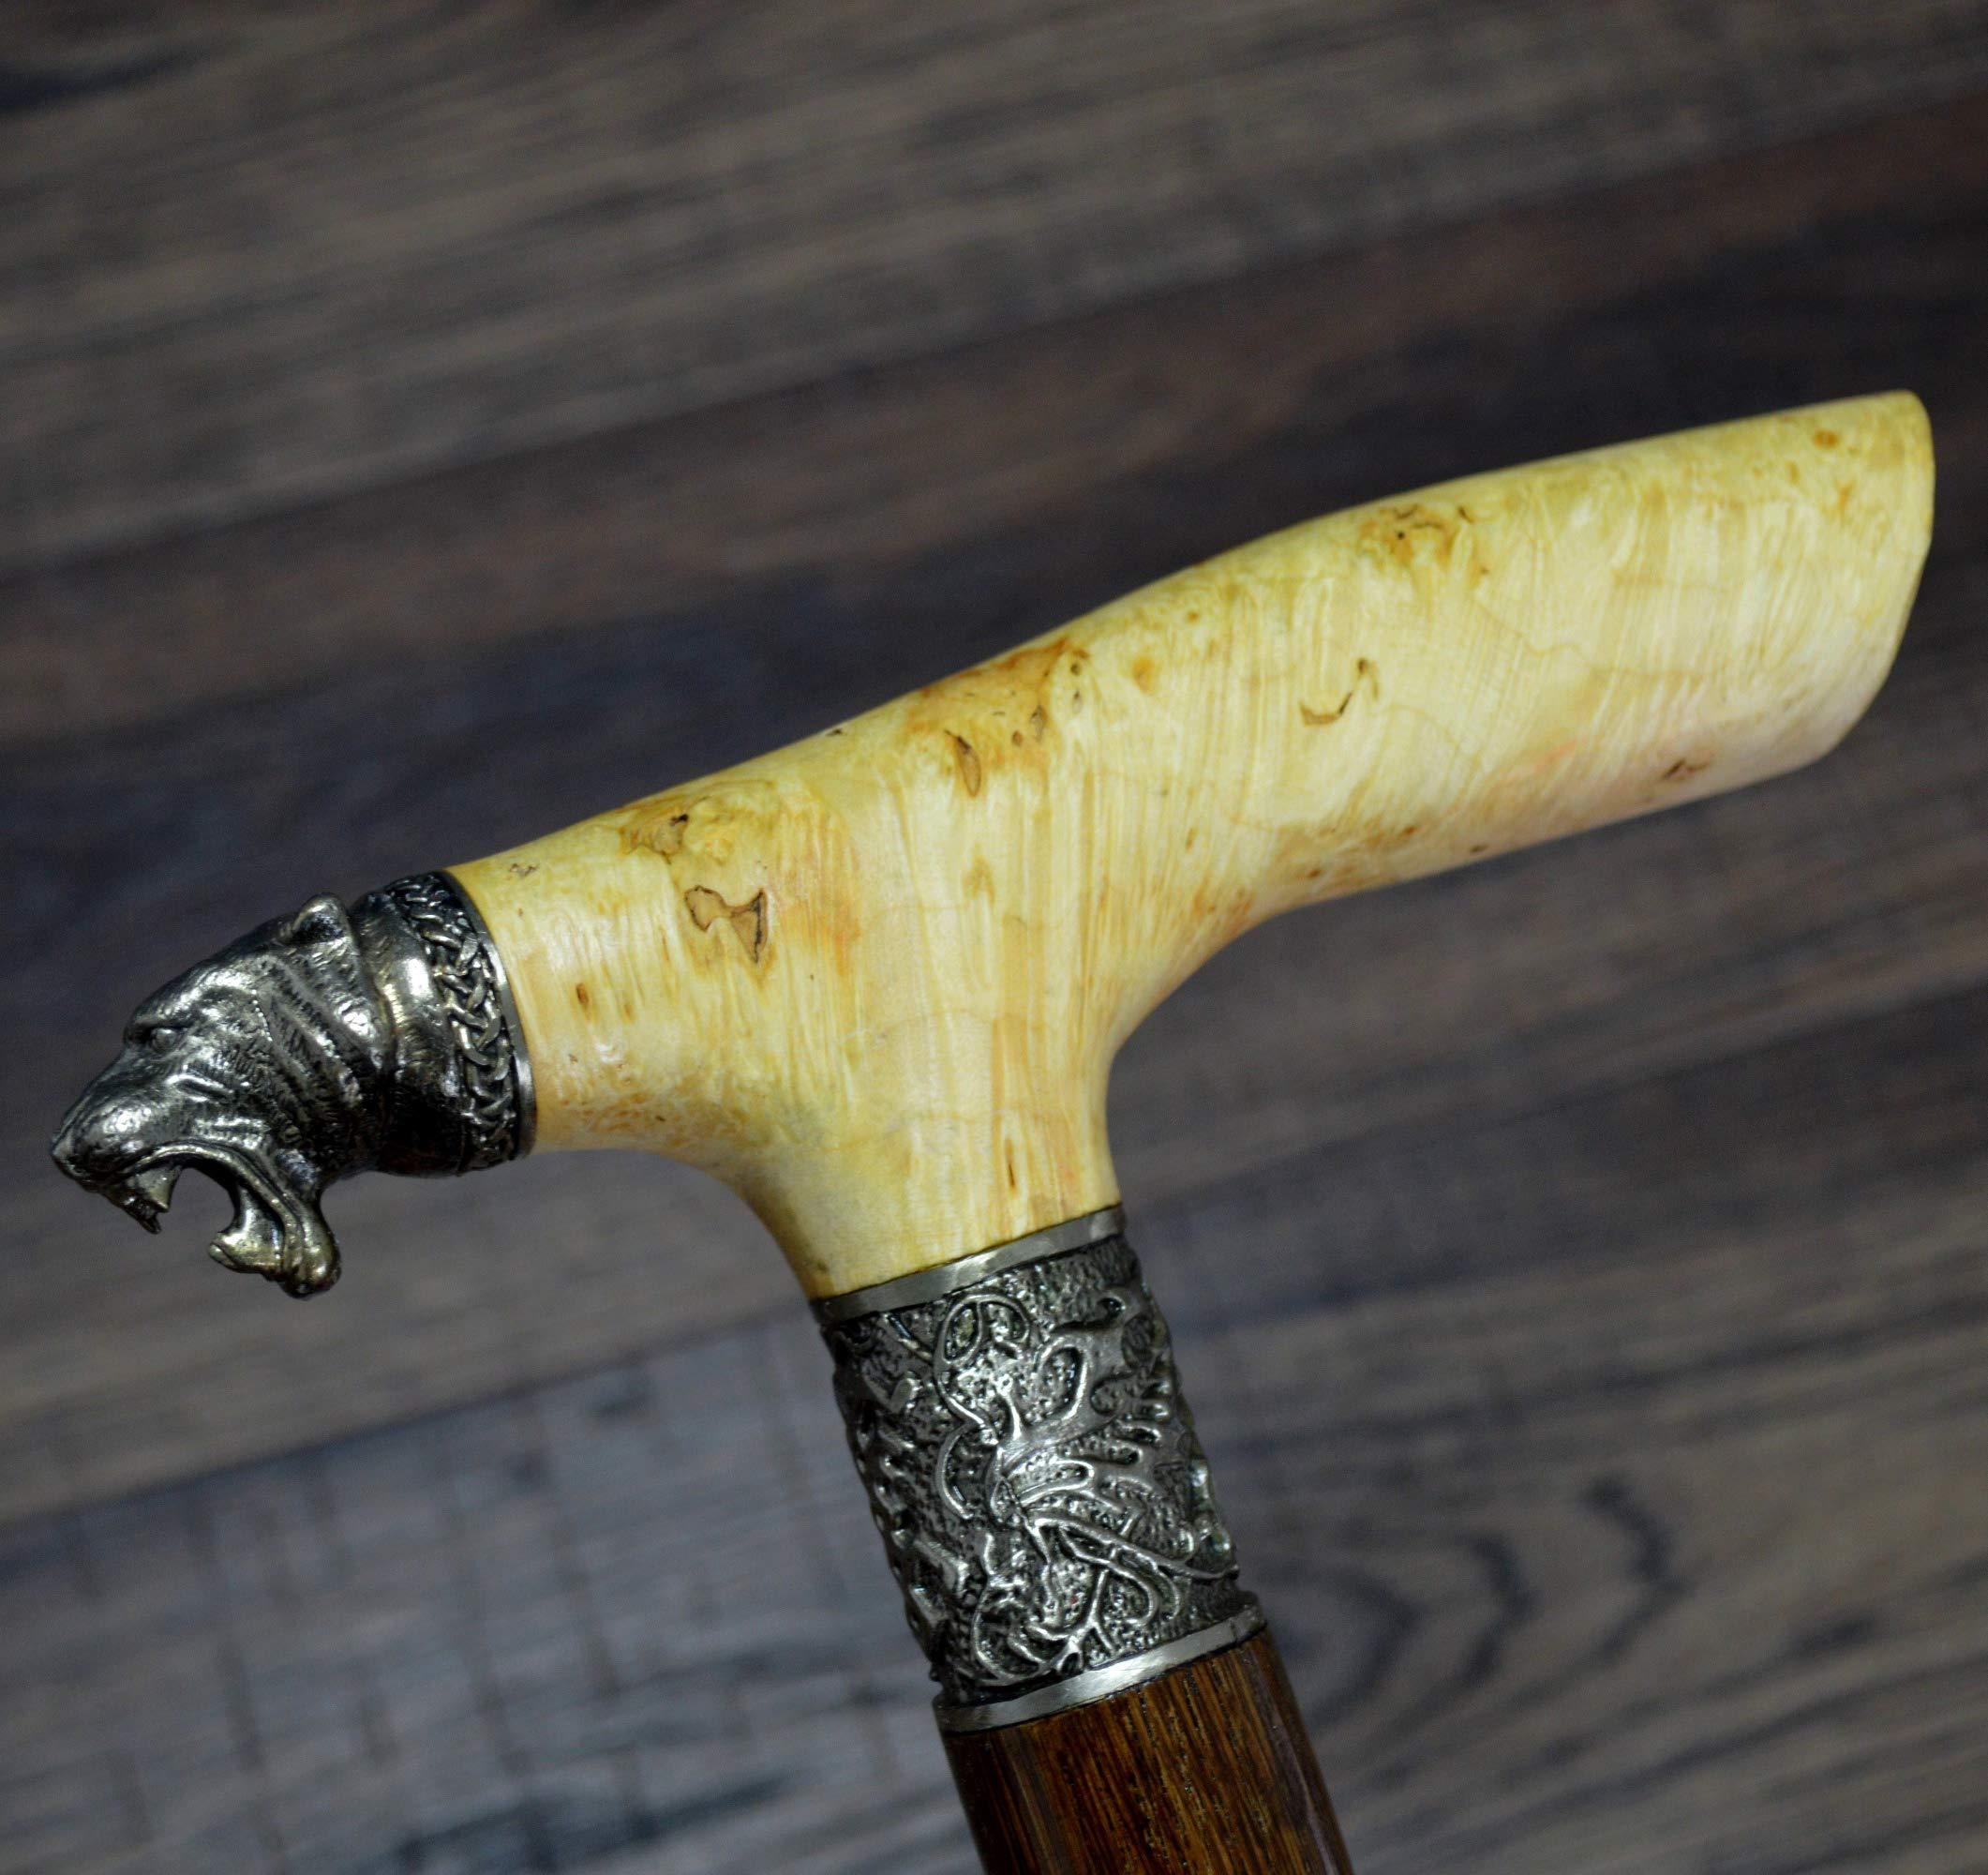 oleksandr.victory Canes Walking Sticks Wood Reeds German Silver Wooden stabilized BURL Handmade Cane Stick Men's Accessories Saber-Toothed